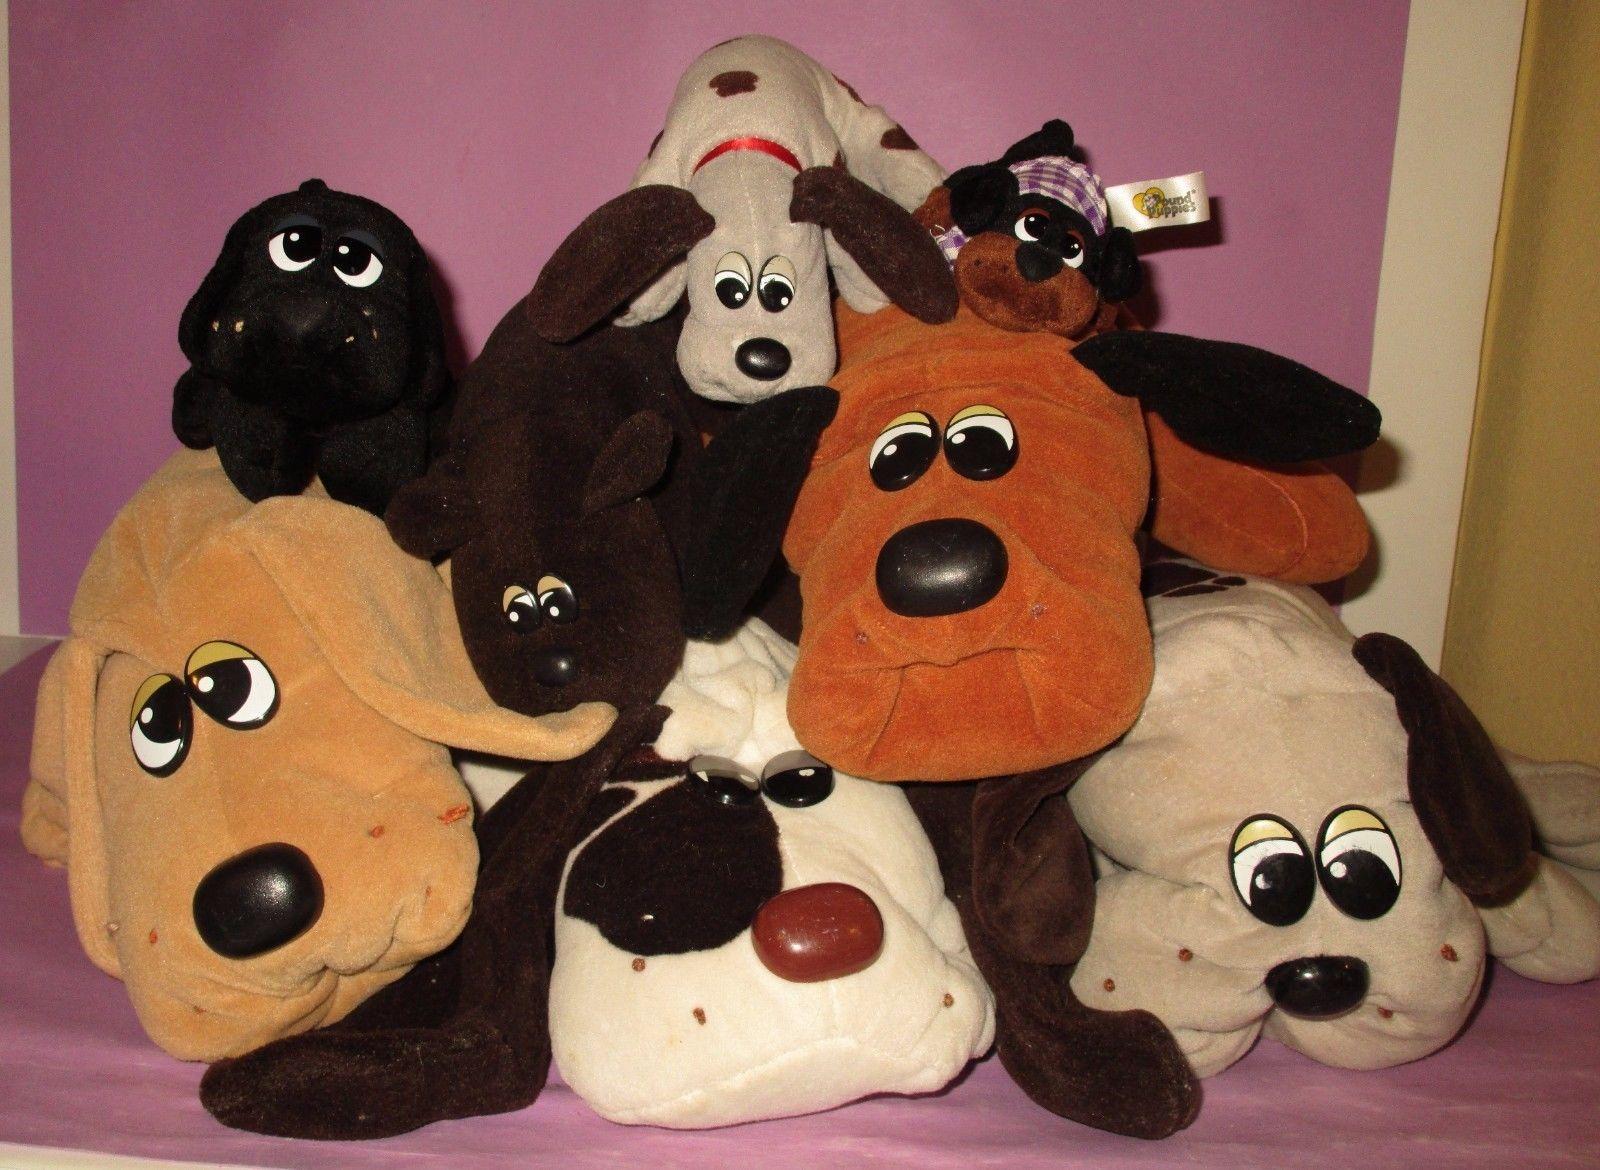 Tonka Pound Puppies Plush Doll 15 listings